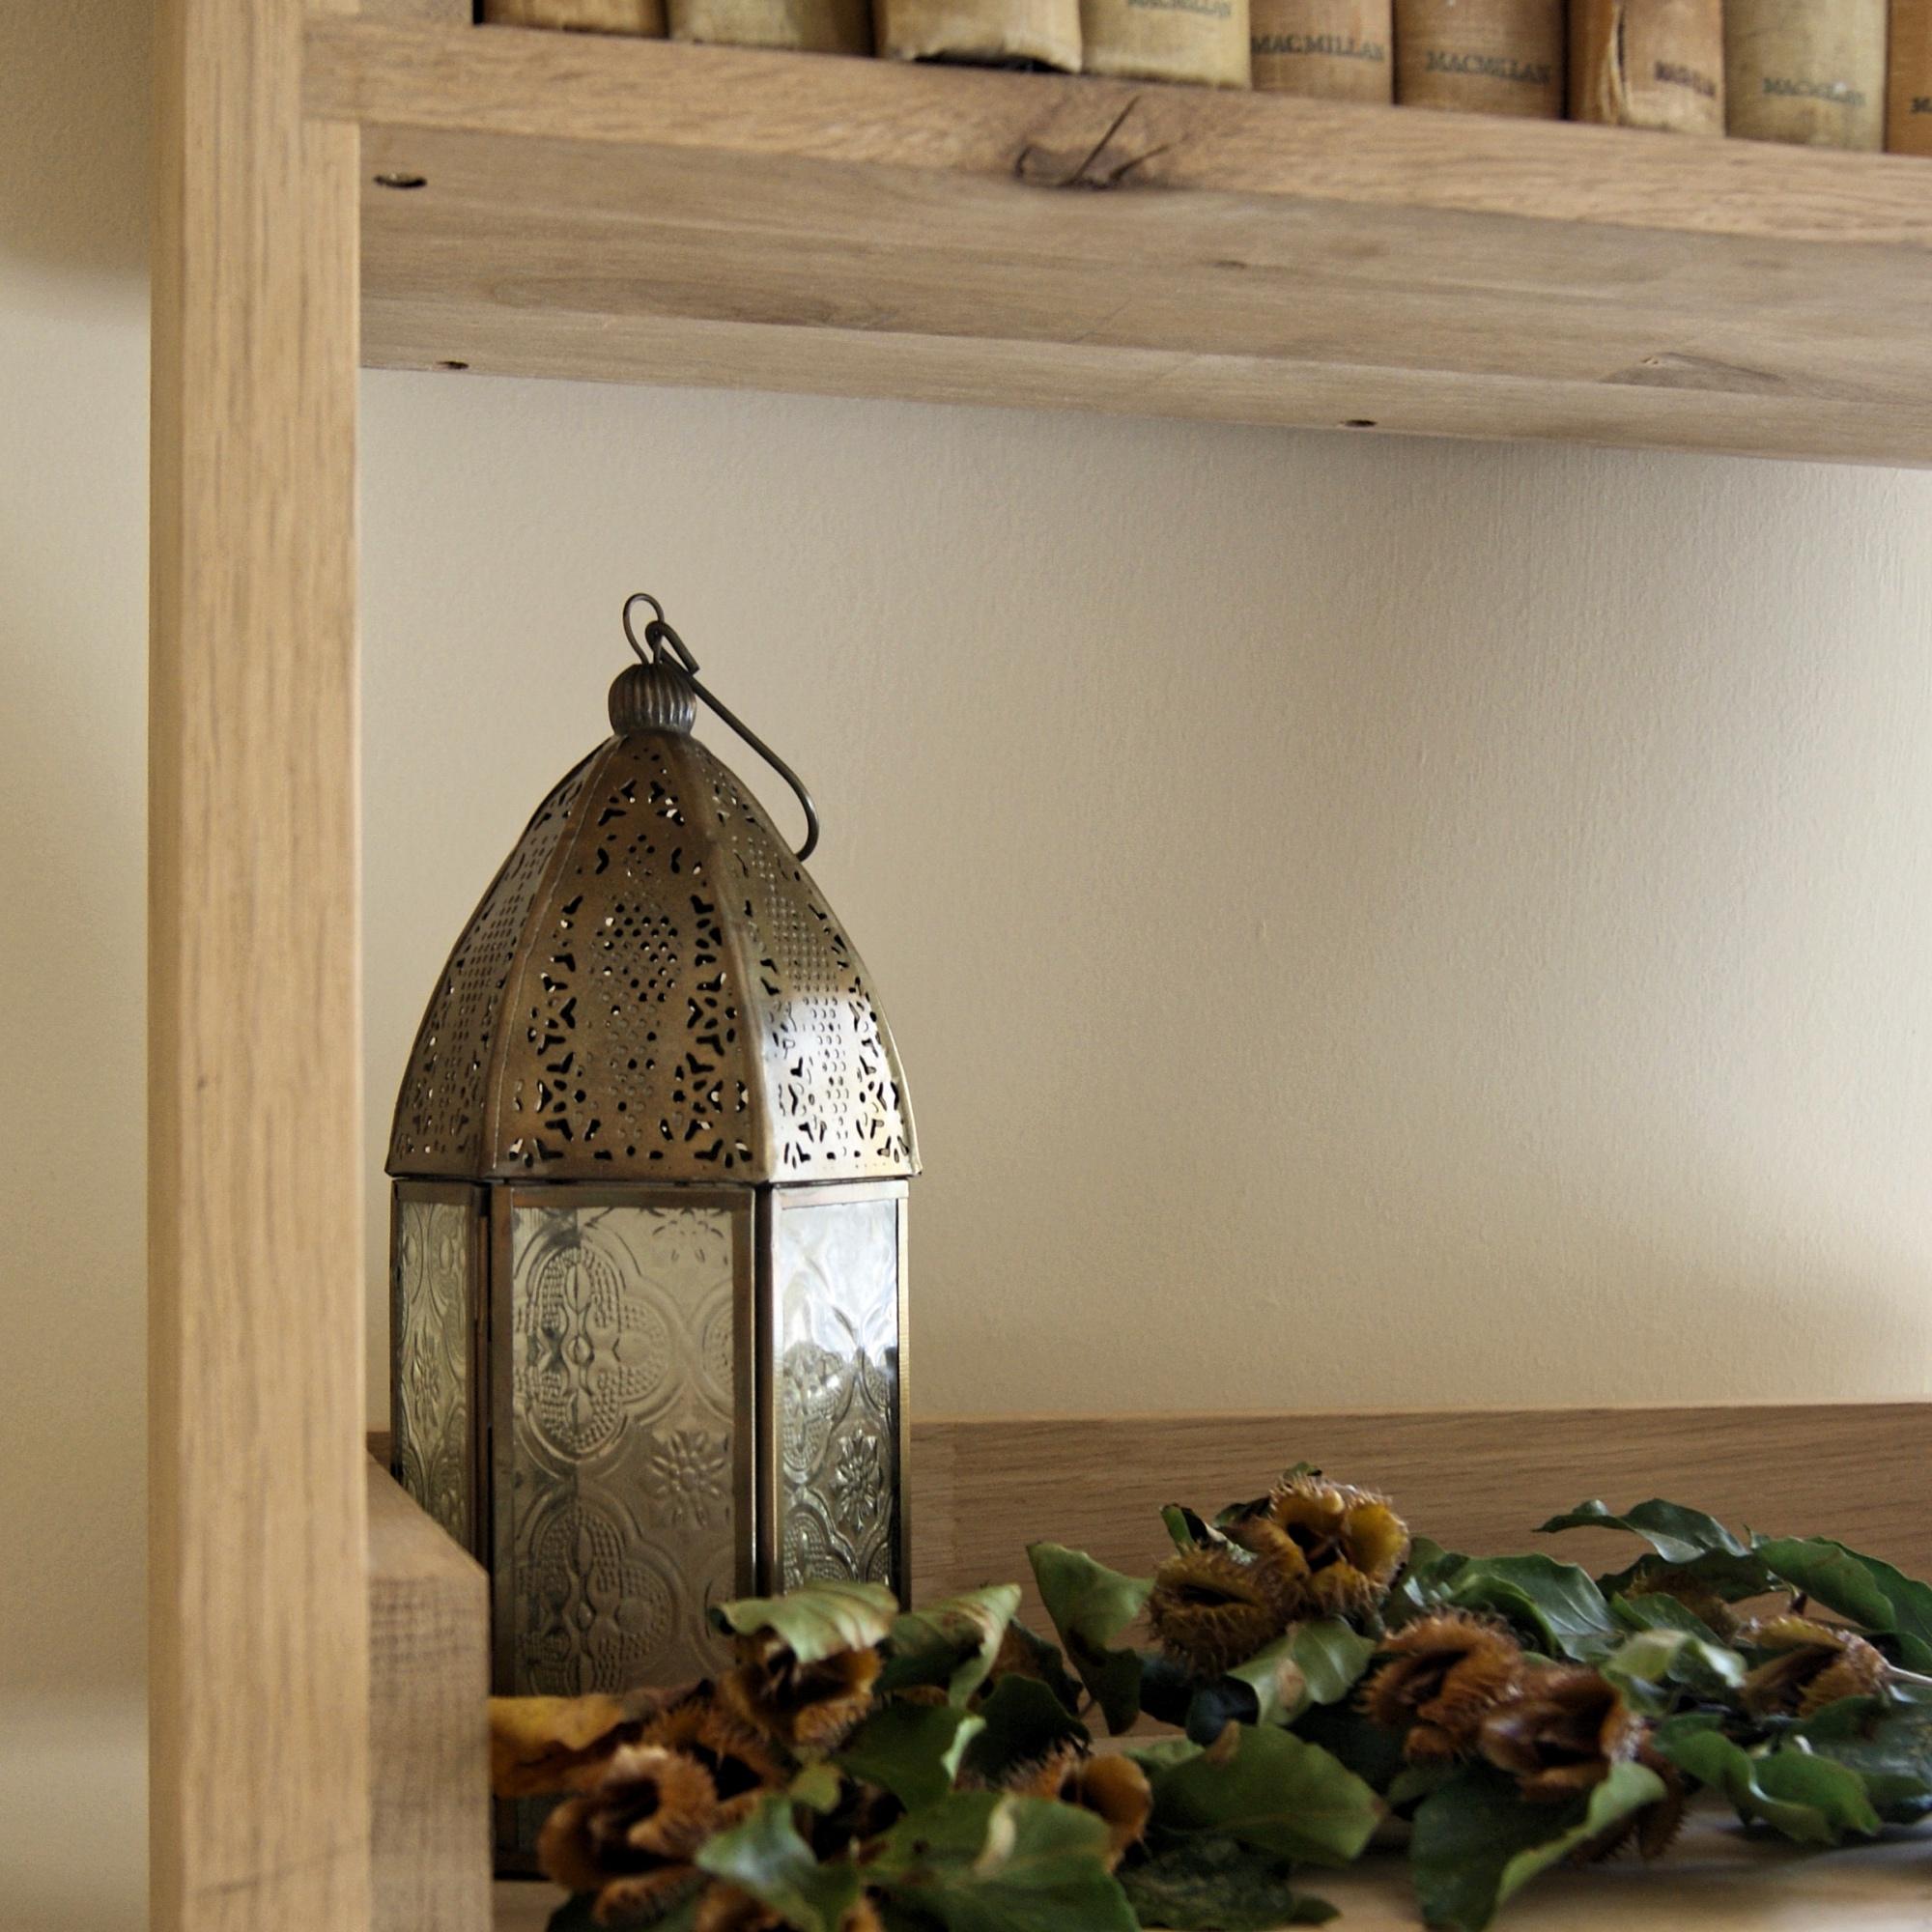 Lantern on book shelf - home fo juniper - home decor.jpg